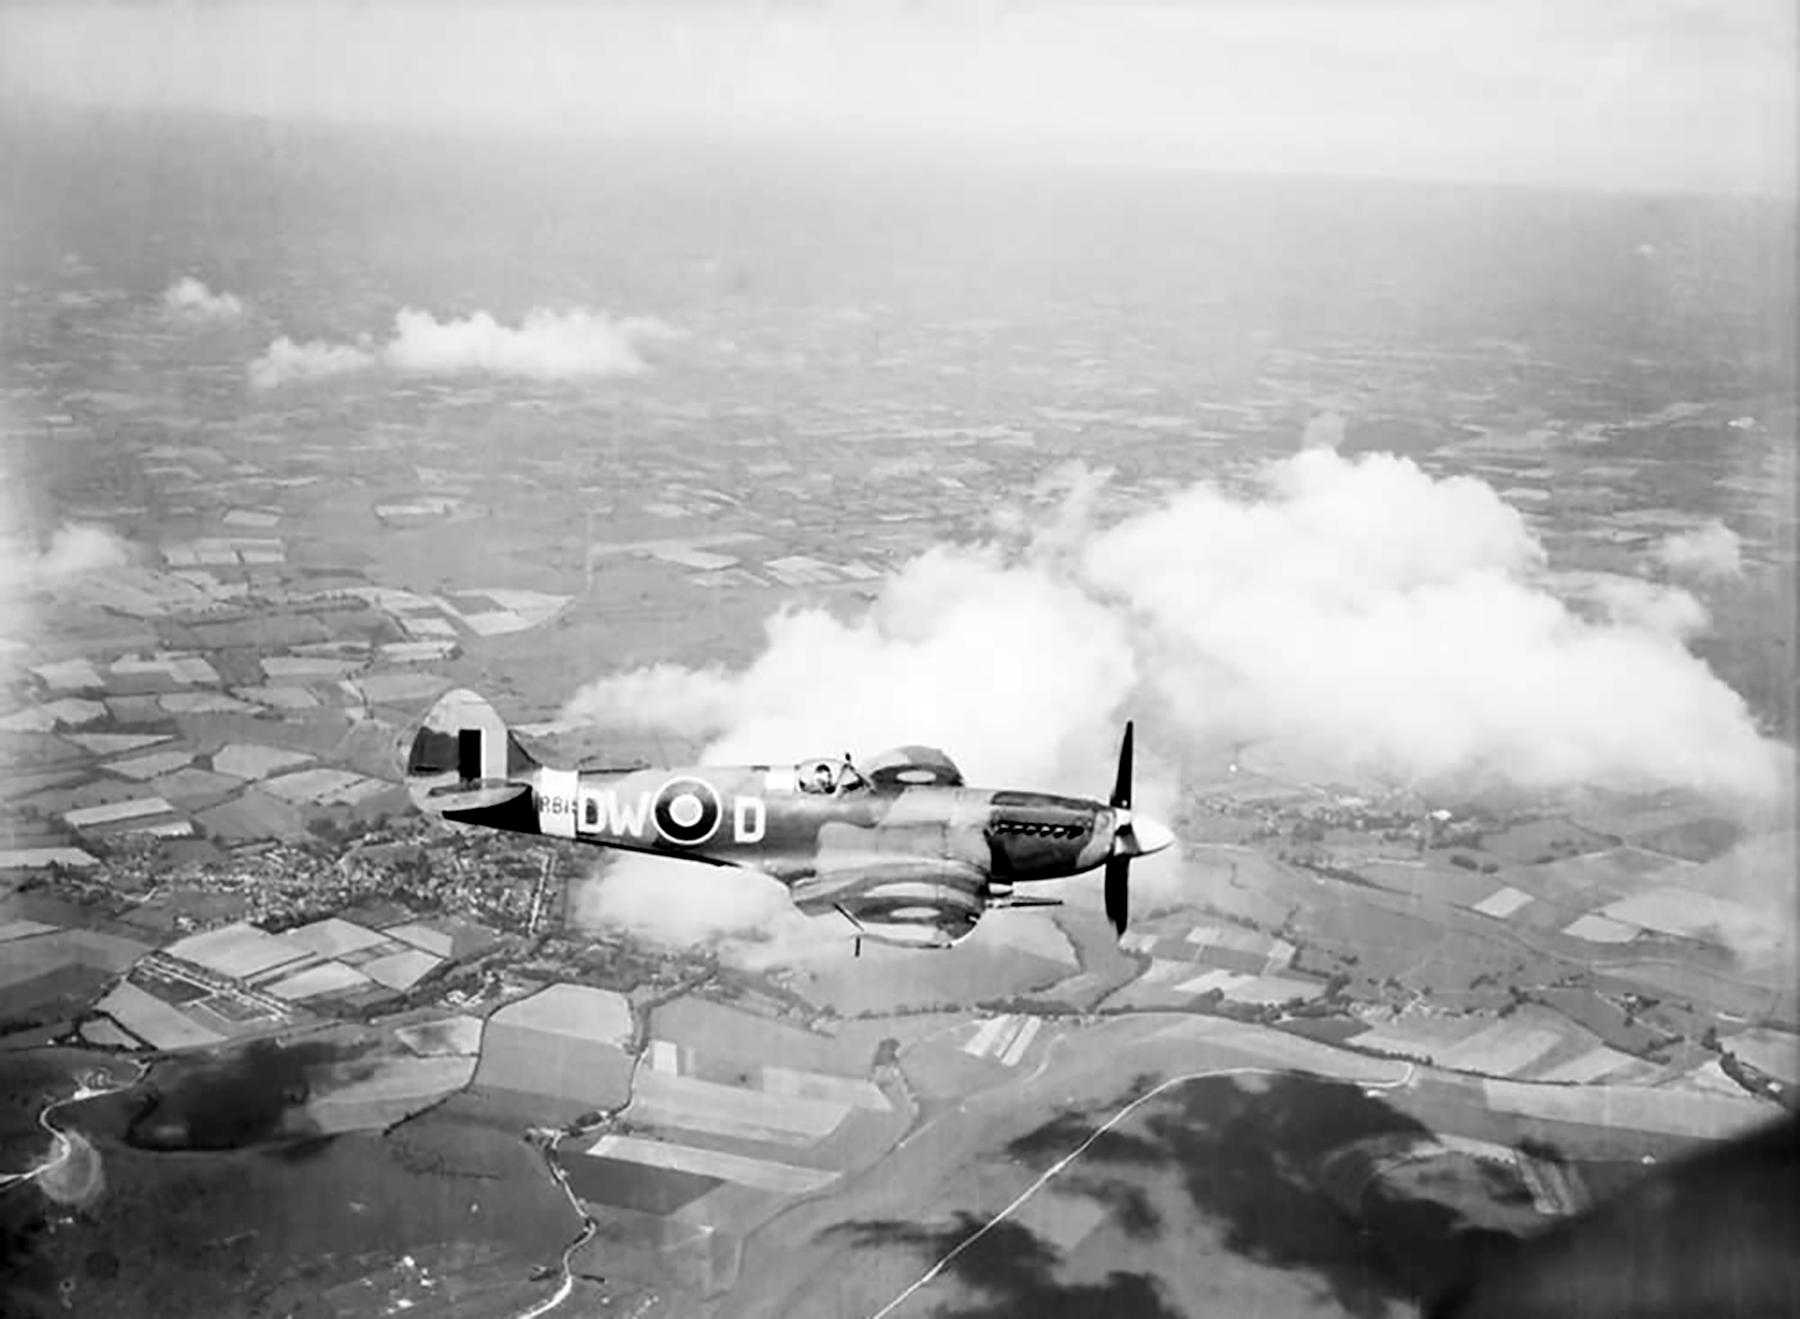 Spitfire FXIV RAF 610Sqn DWD RB159 in flight web 01